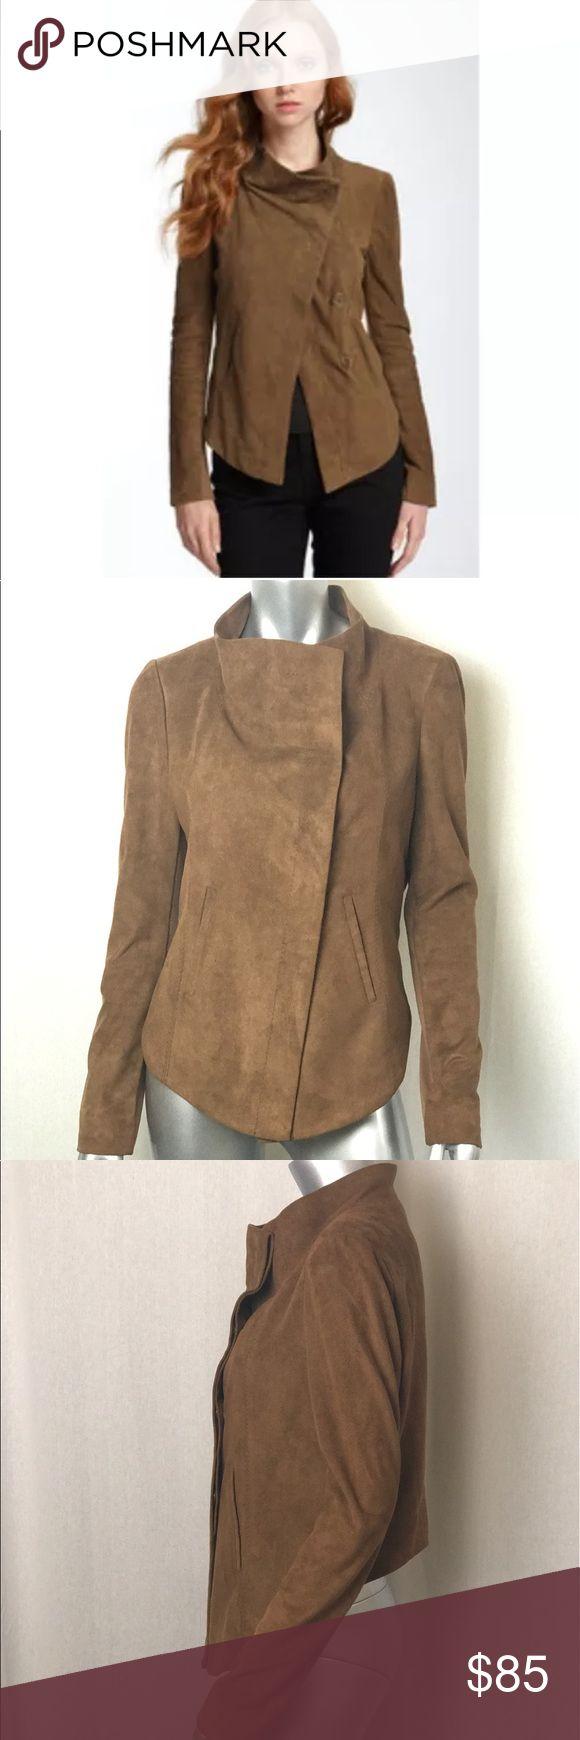 Bcbg Max Azria Faux Suede Jacket Size M Brown faux suede jacket  cropped in the back size m BCBGMaxAzria Jackets & Coats Blazers